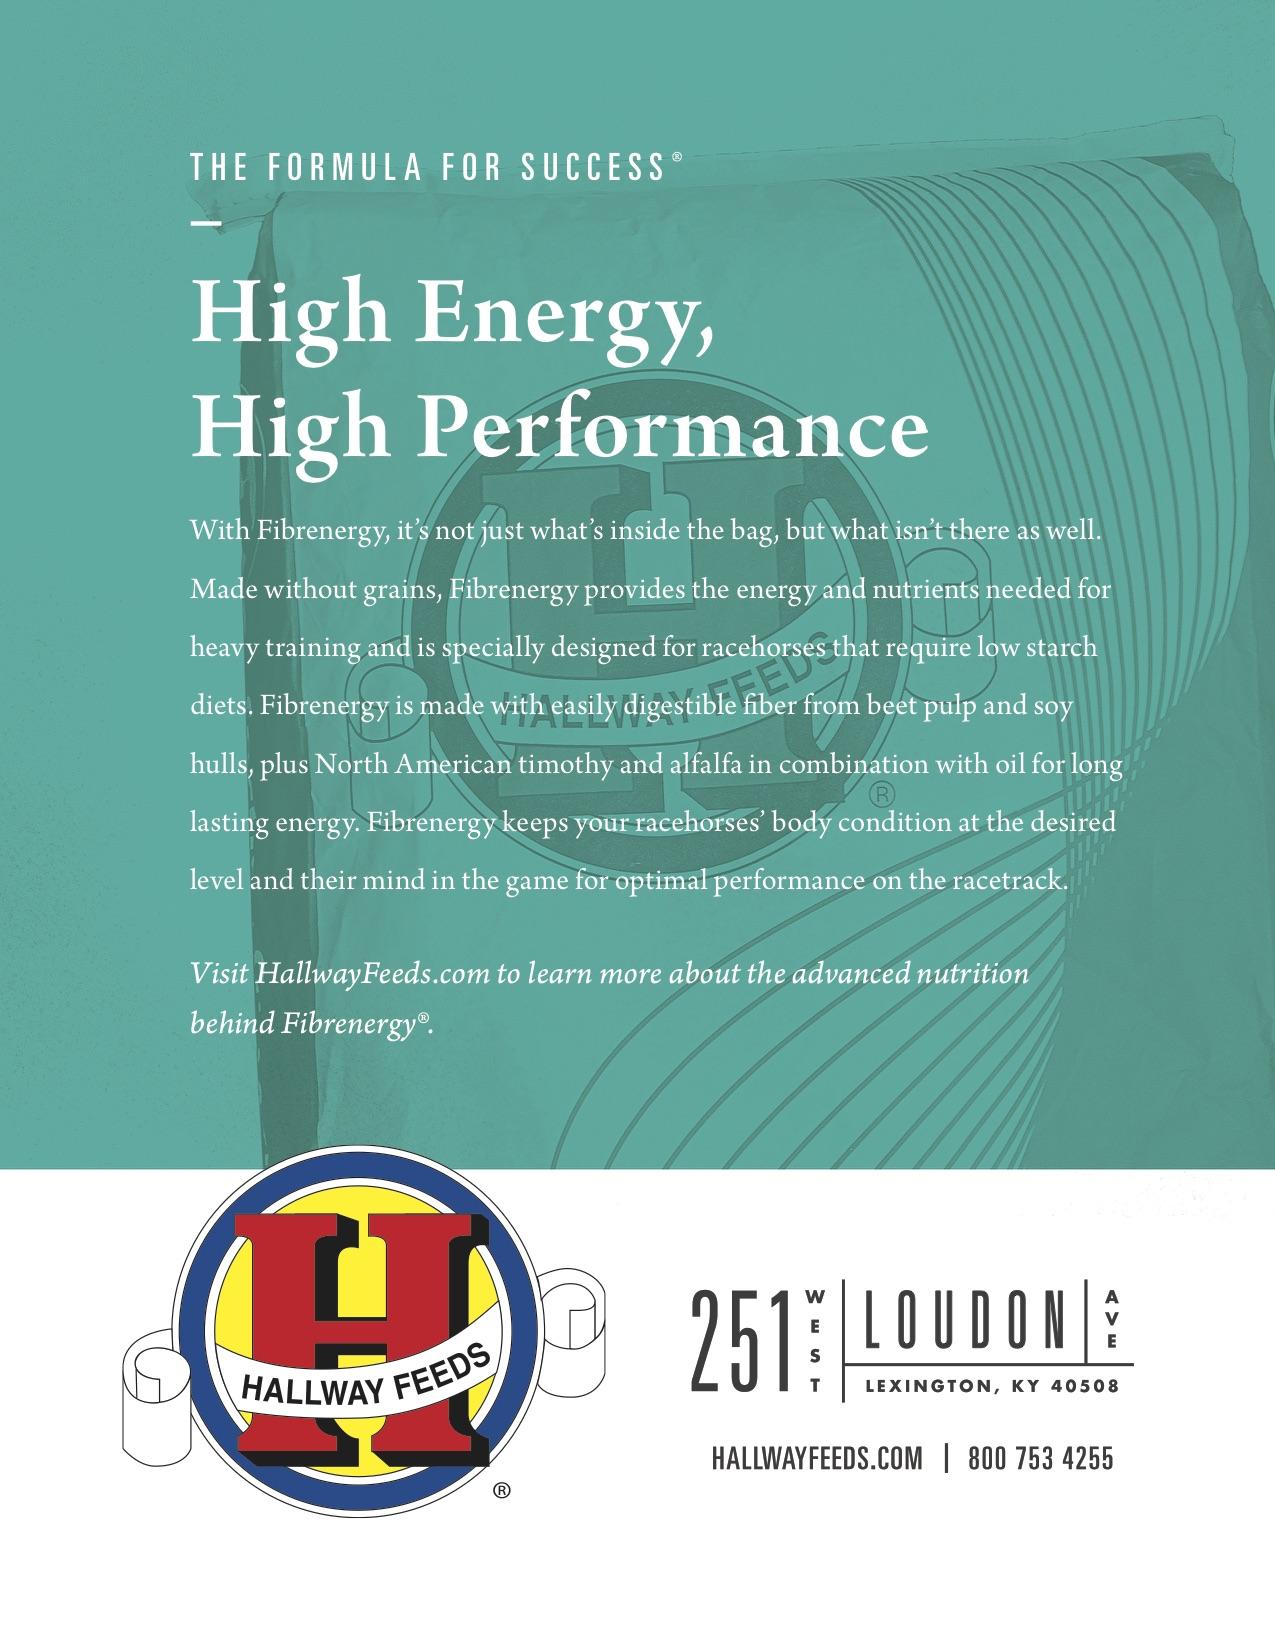 2894 HF 2016 TDN 6_18 Fibrenergy.jpg